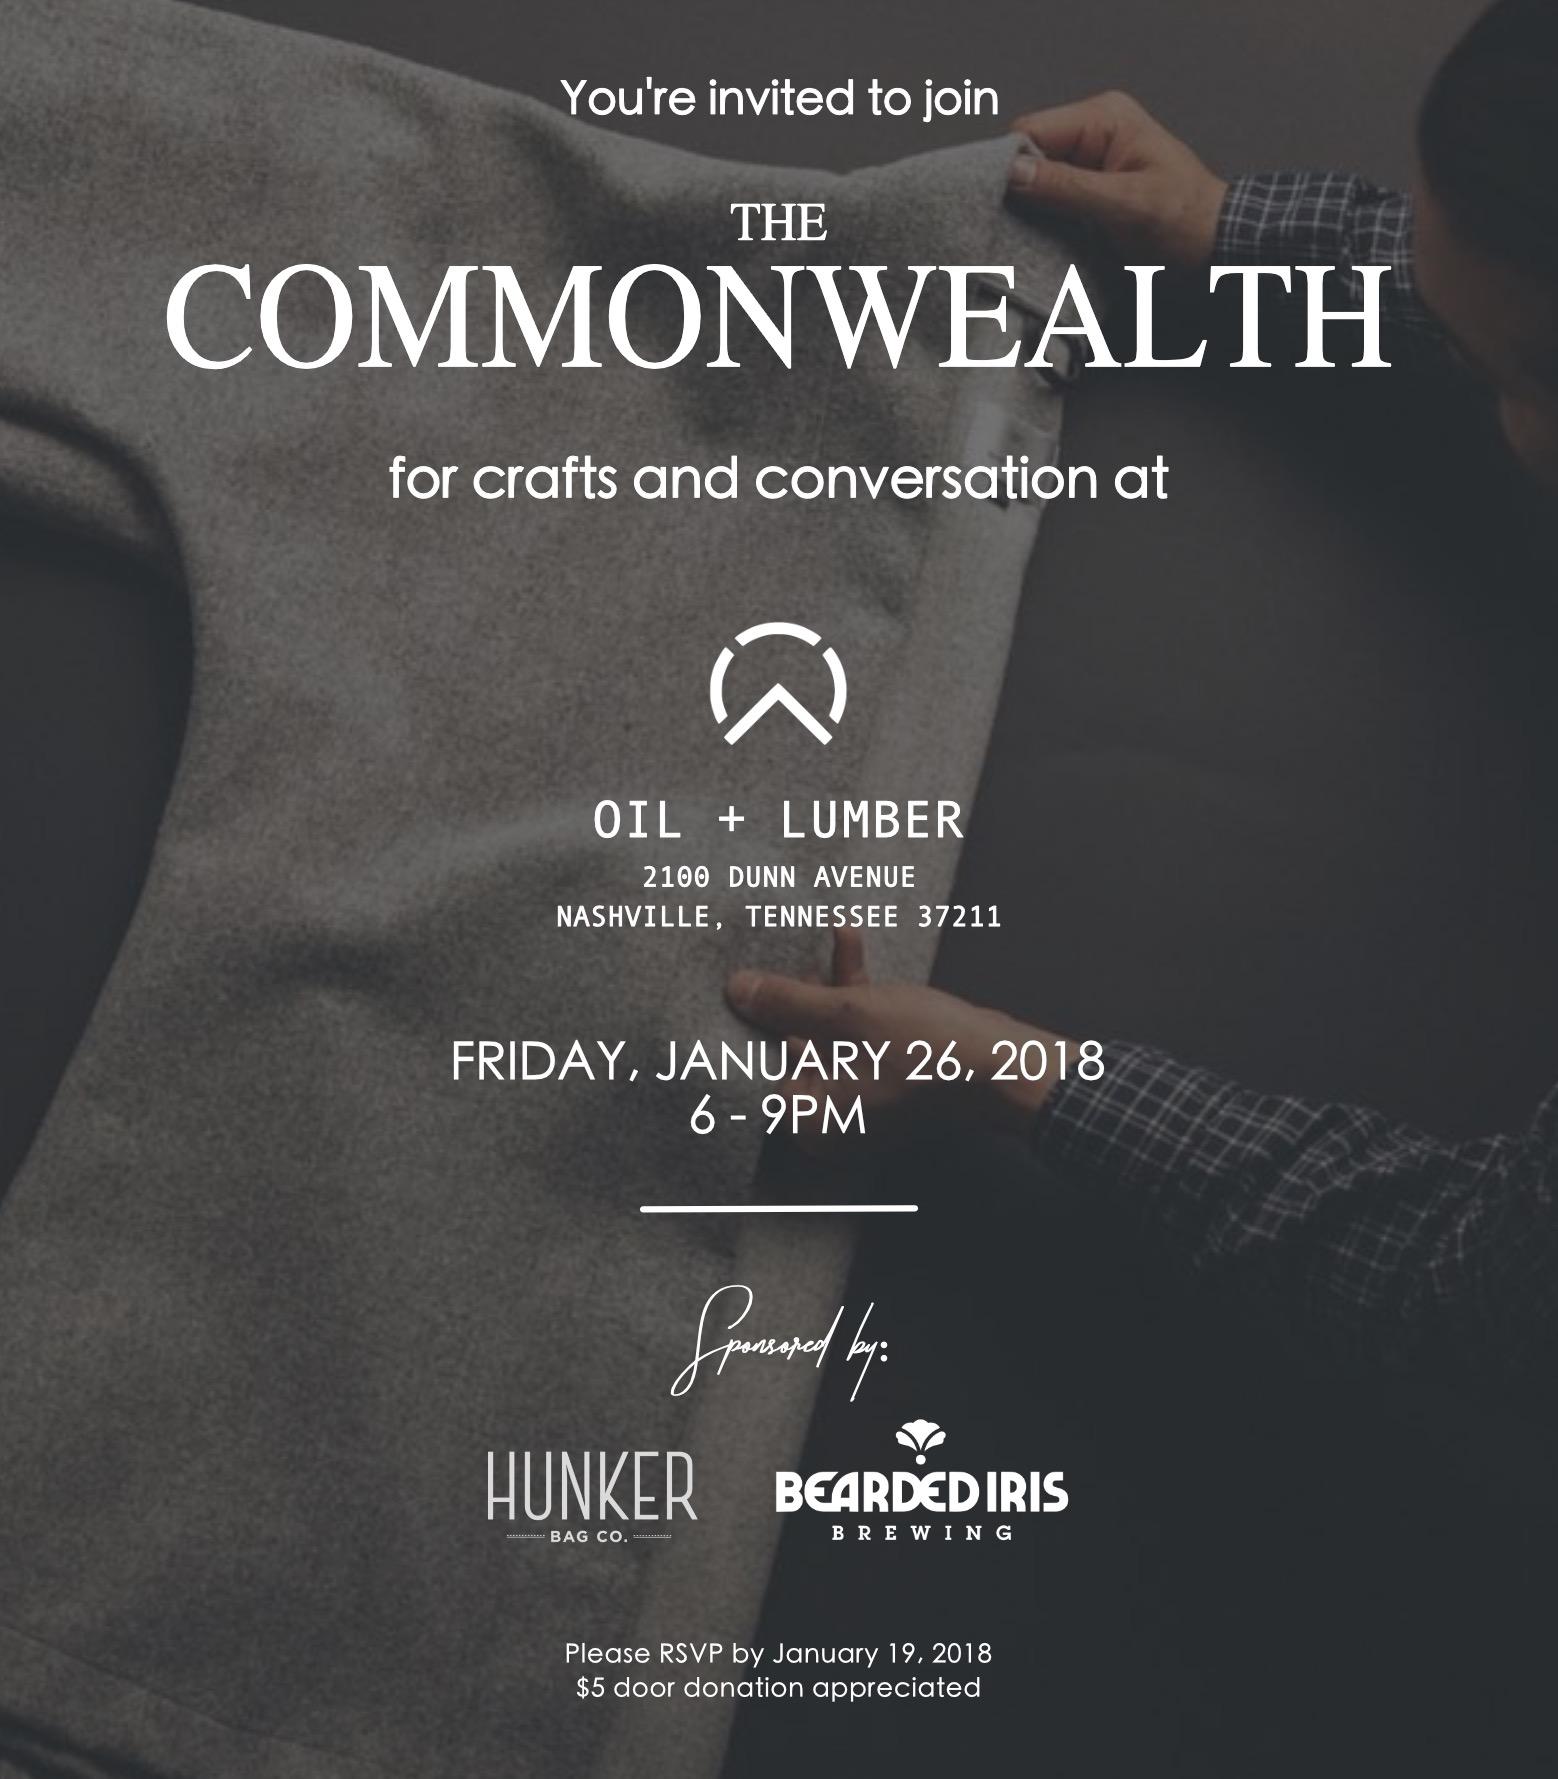 January 2018 - Oil + Lumber   Sponsored by Hunker Bag Co. & Bearded Iris Brewing